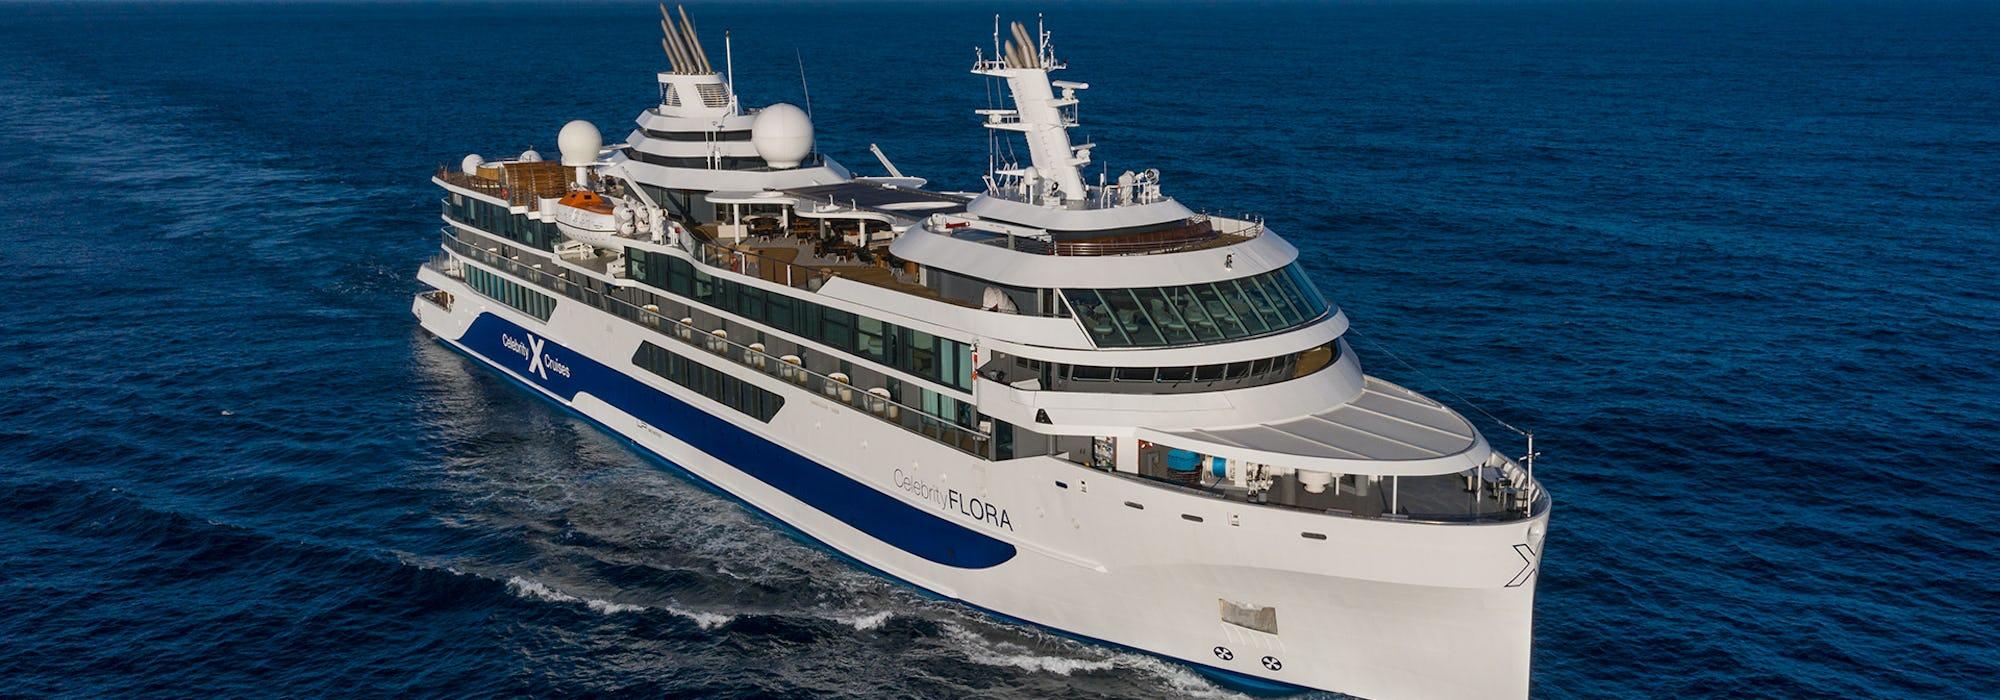 Det mindre fartyget Celebrity Flora kryssar sig fram i klartblått vatten.